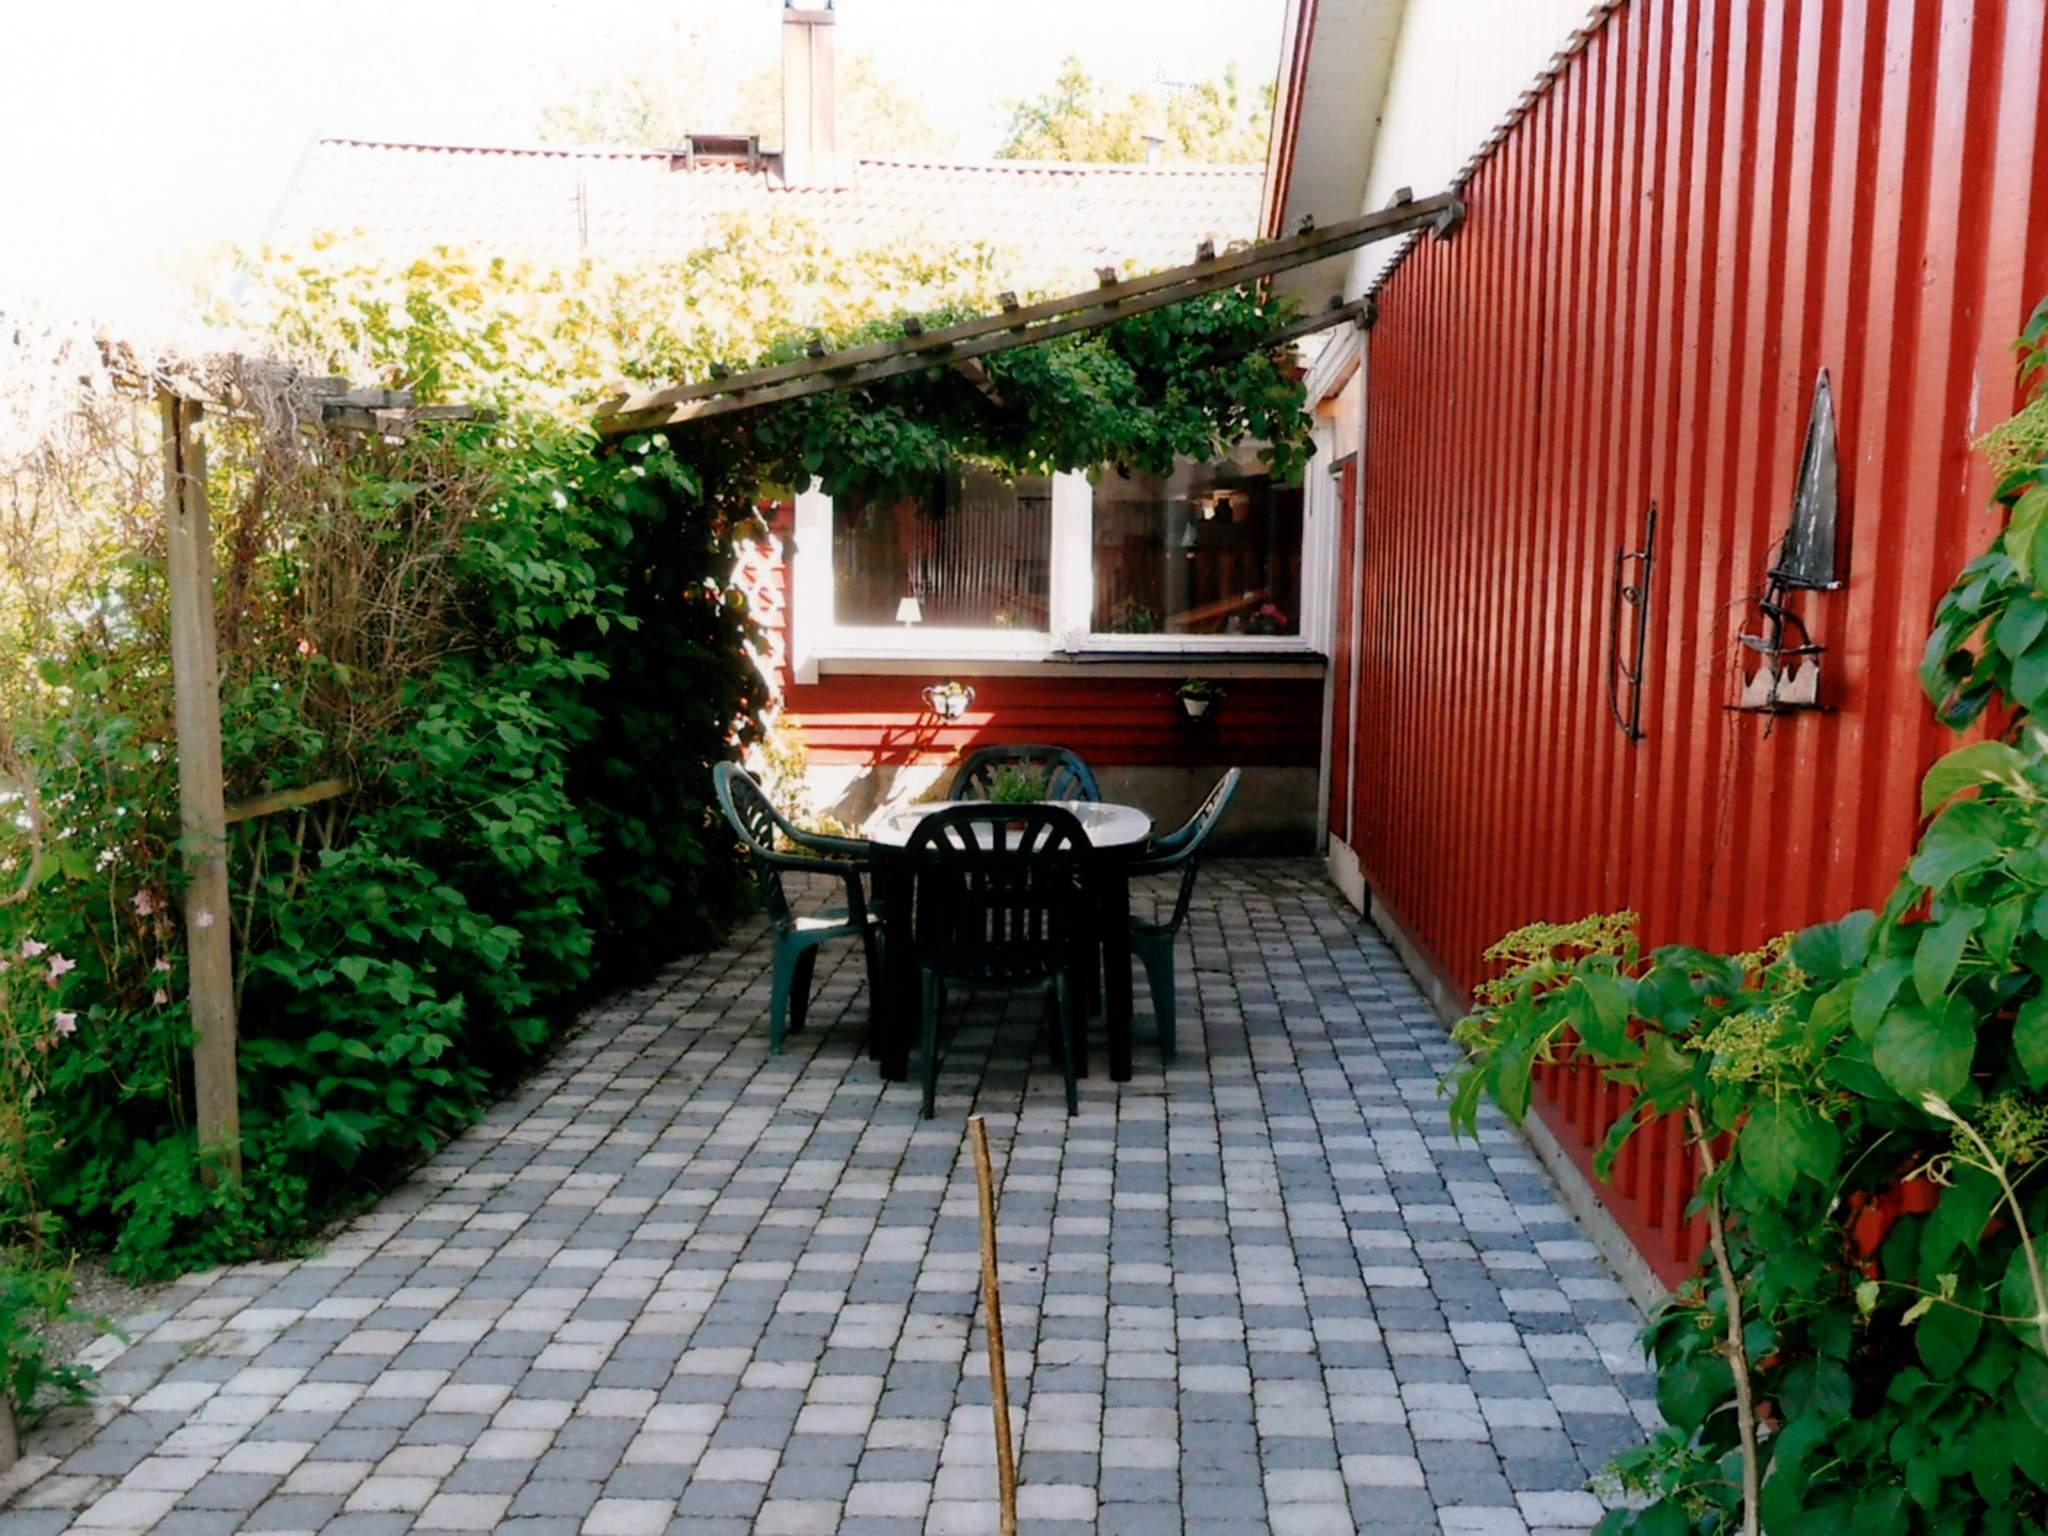 Ferienhaus Finjasjön (86936), Hässleholm, Skane län, Südschweden, Schweden, Bild 12